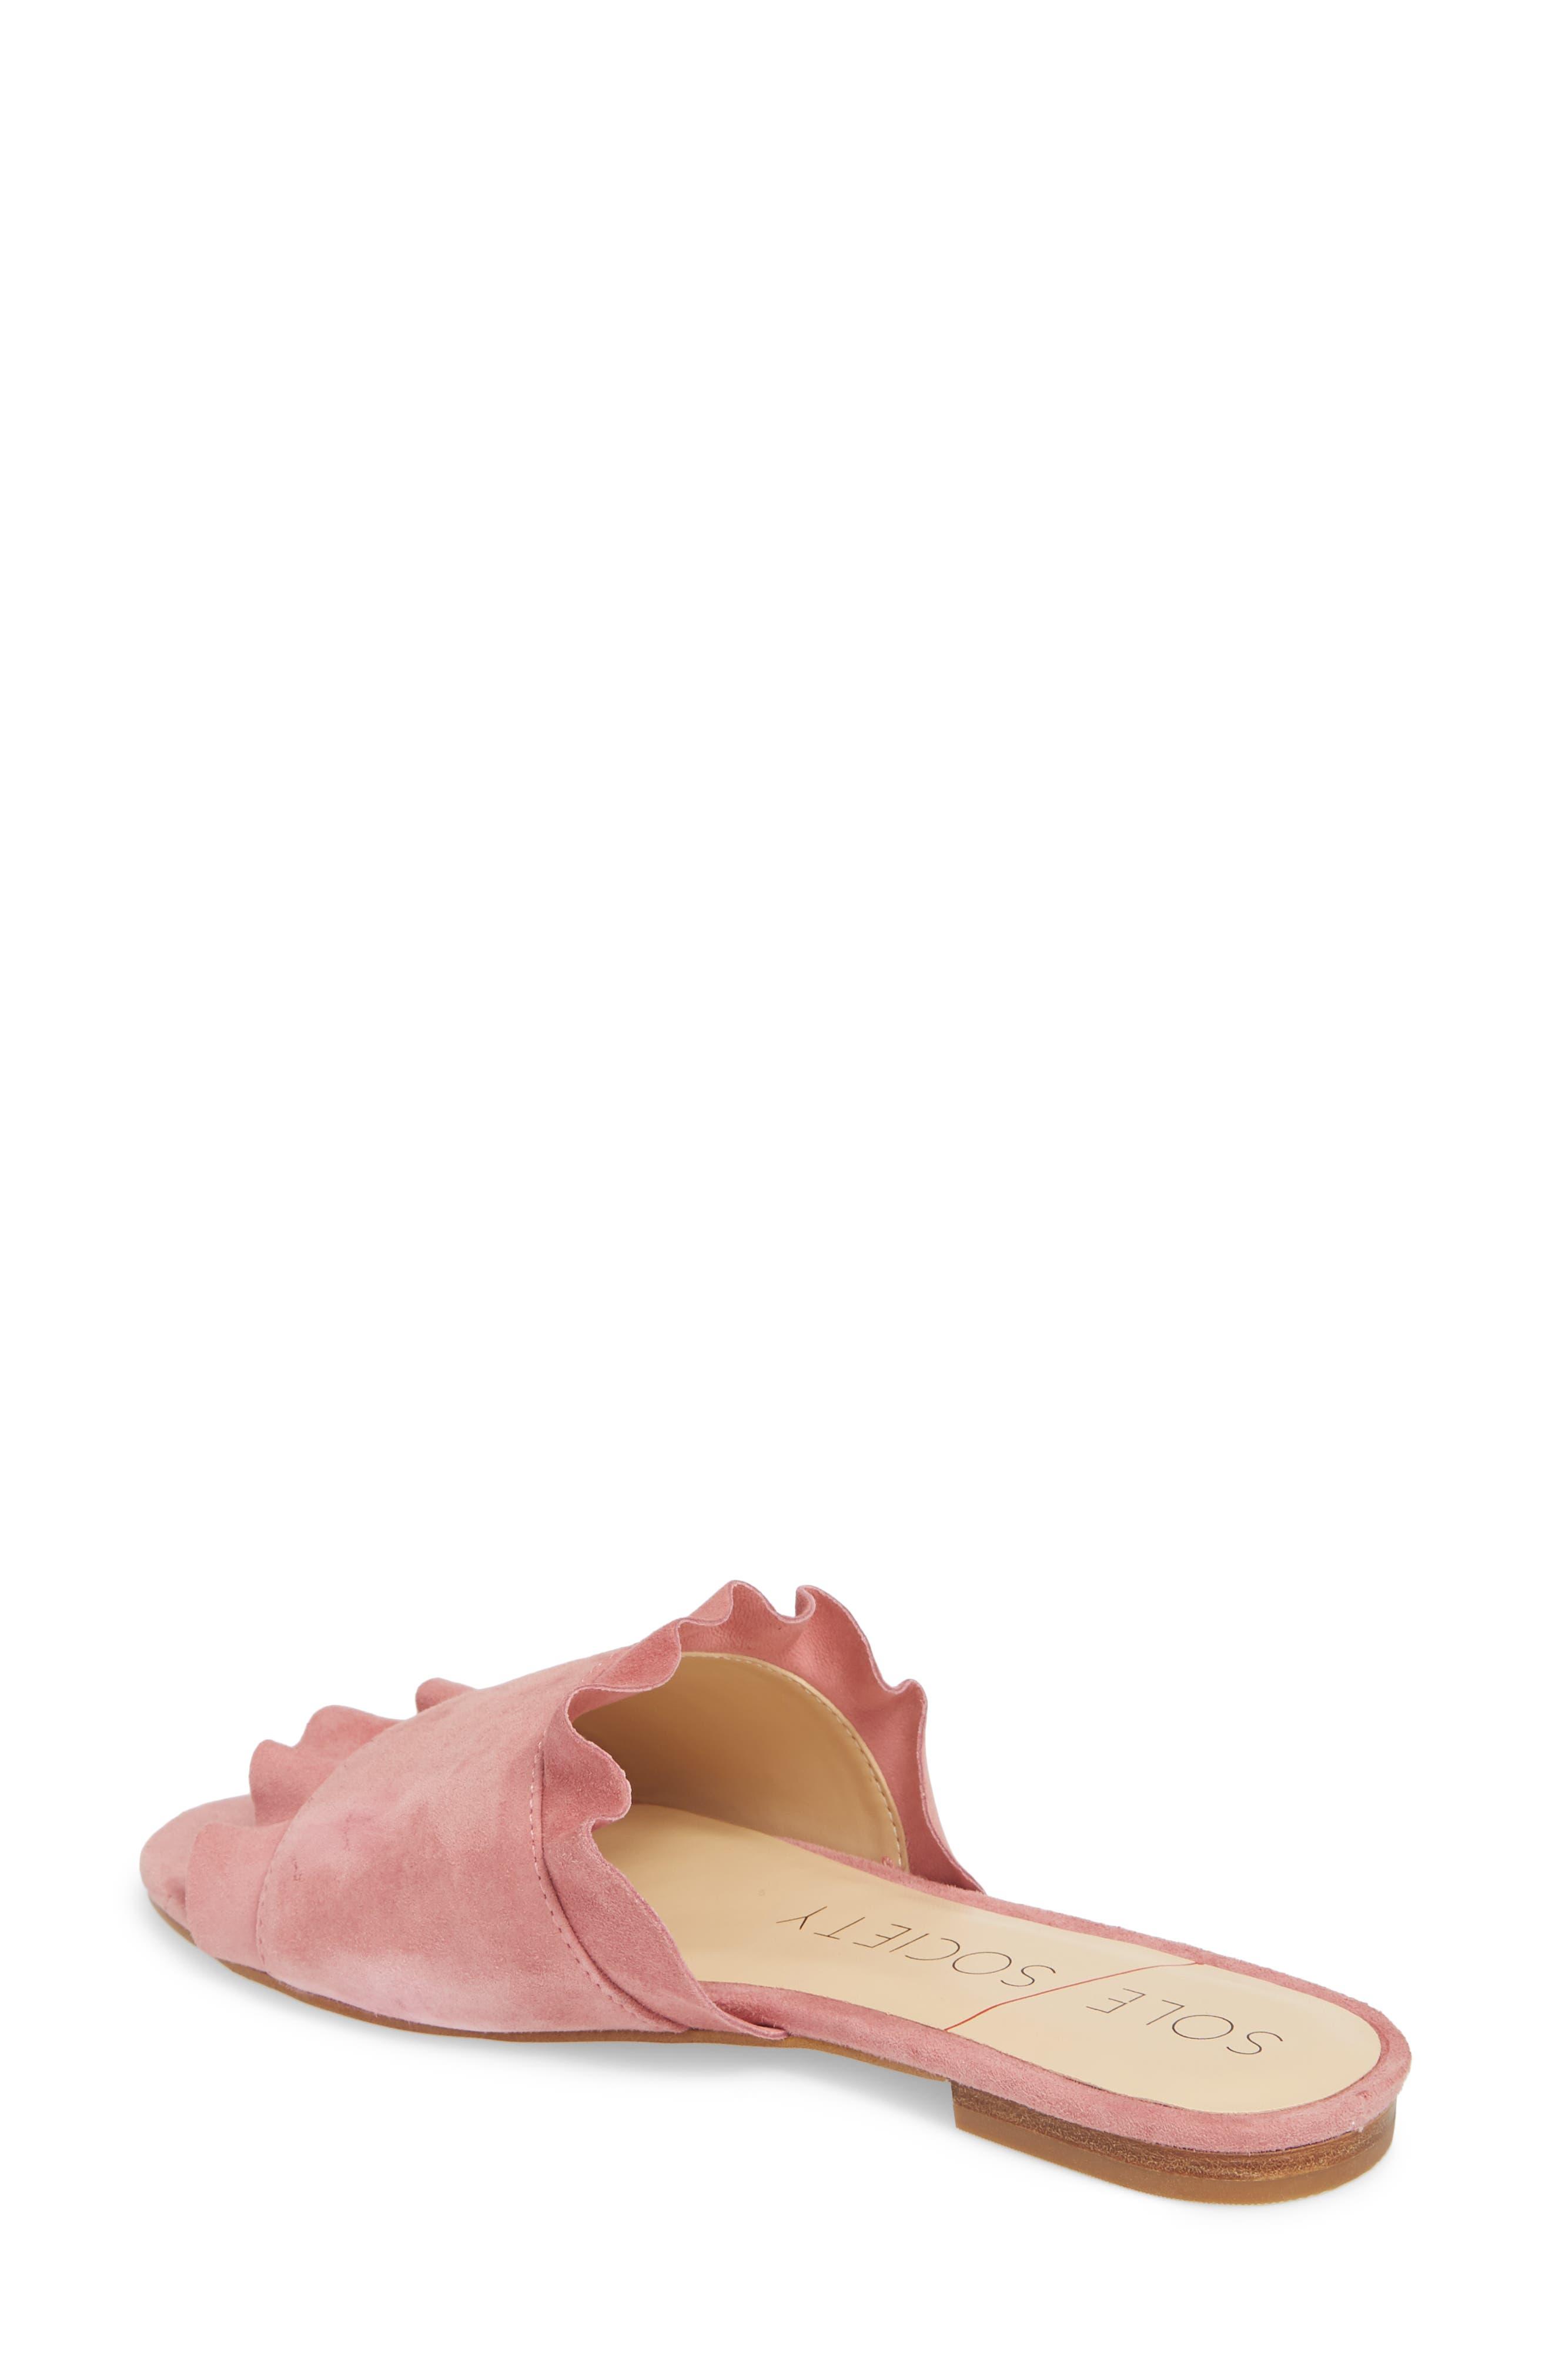 So-Madalayne Flat Sandal,                             Alternate thumbnail 2, color,                             658